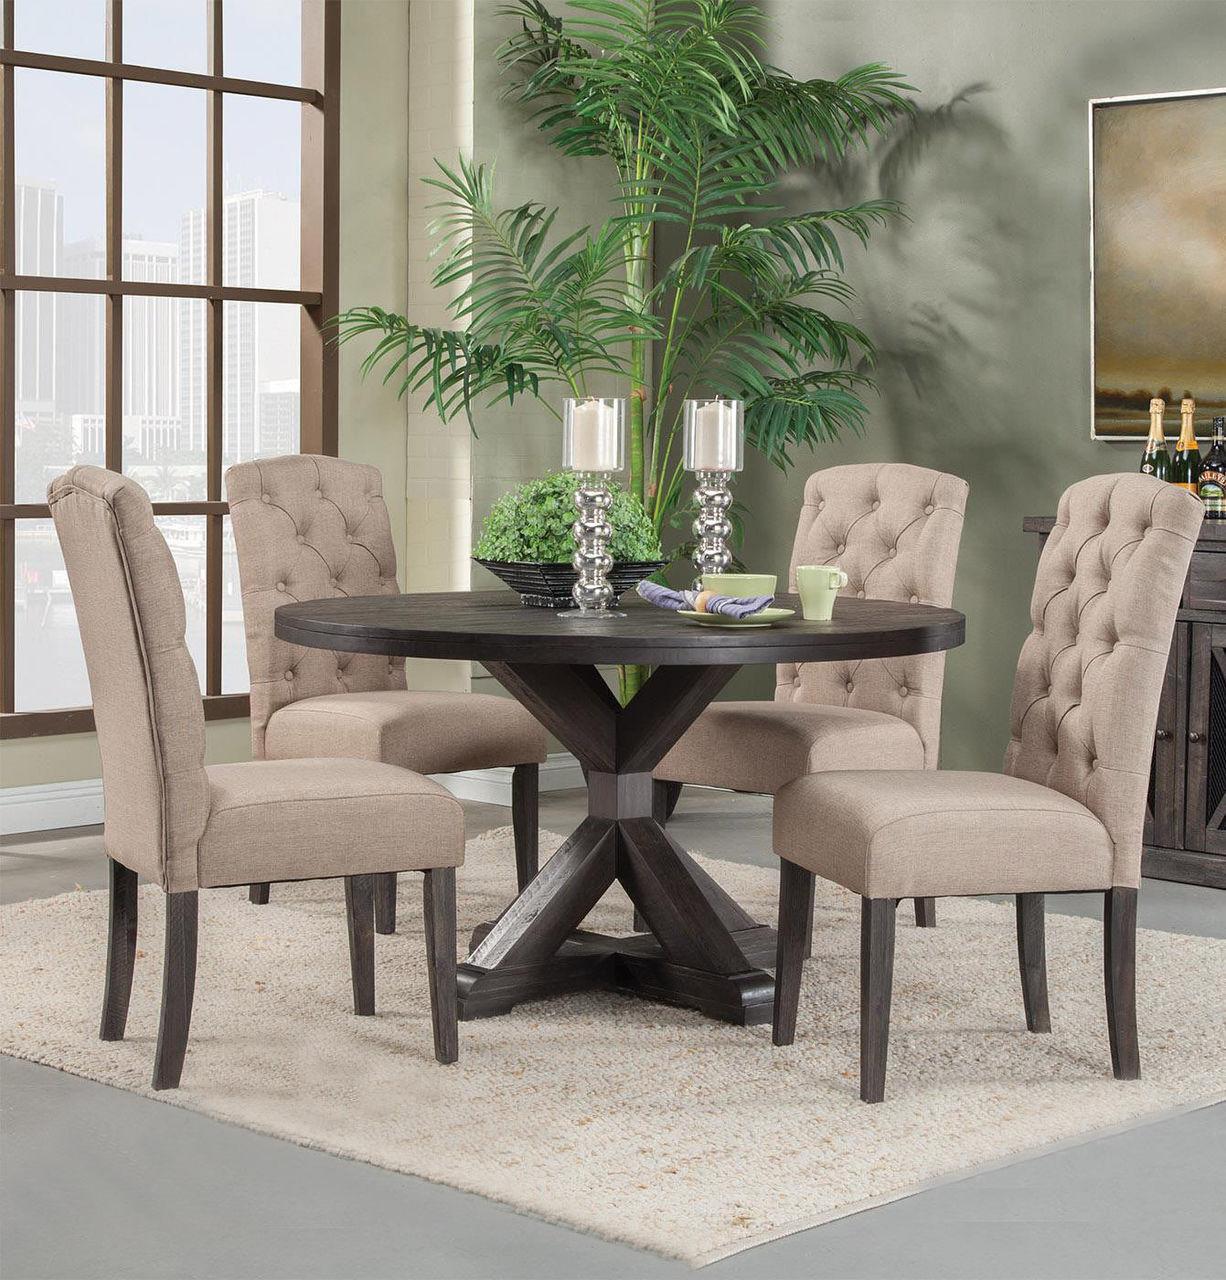 Alpine Round Dining Table